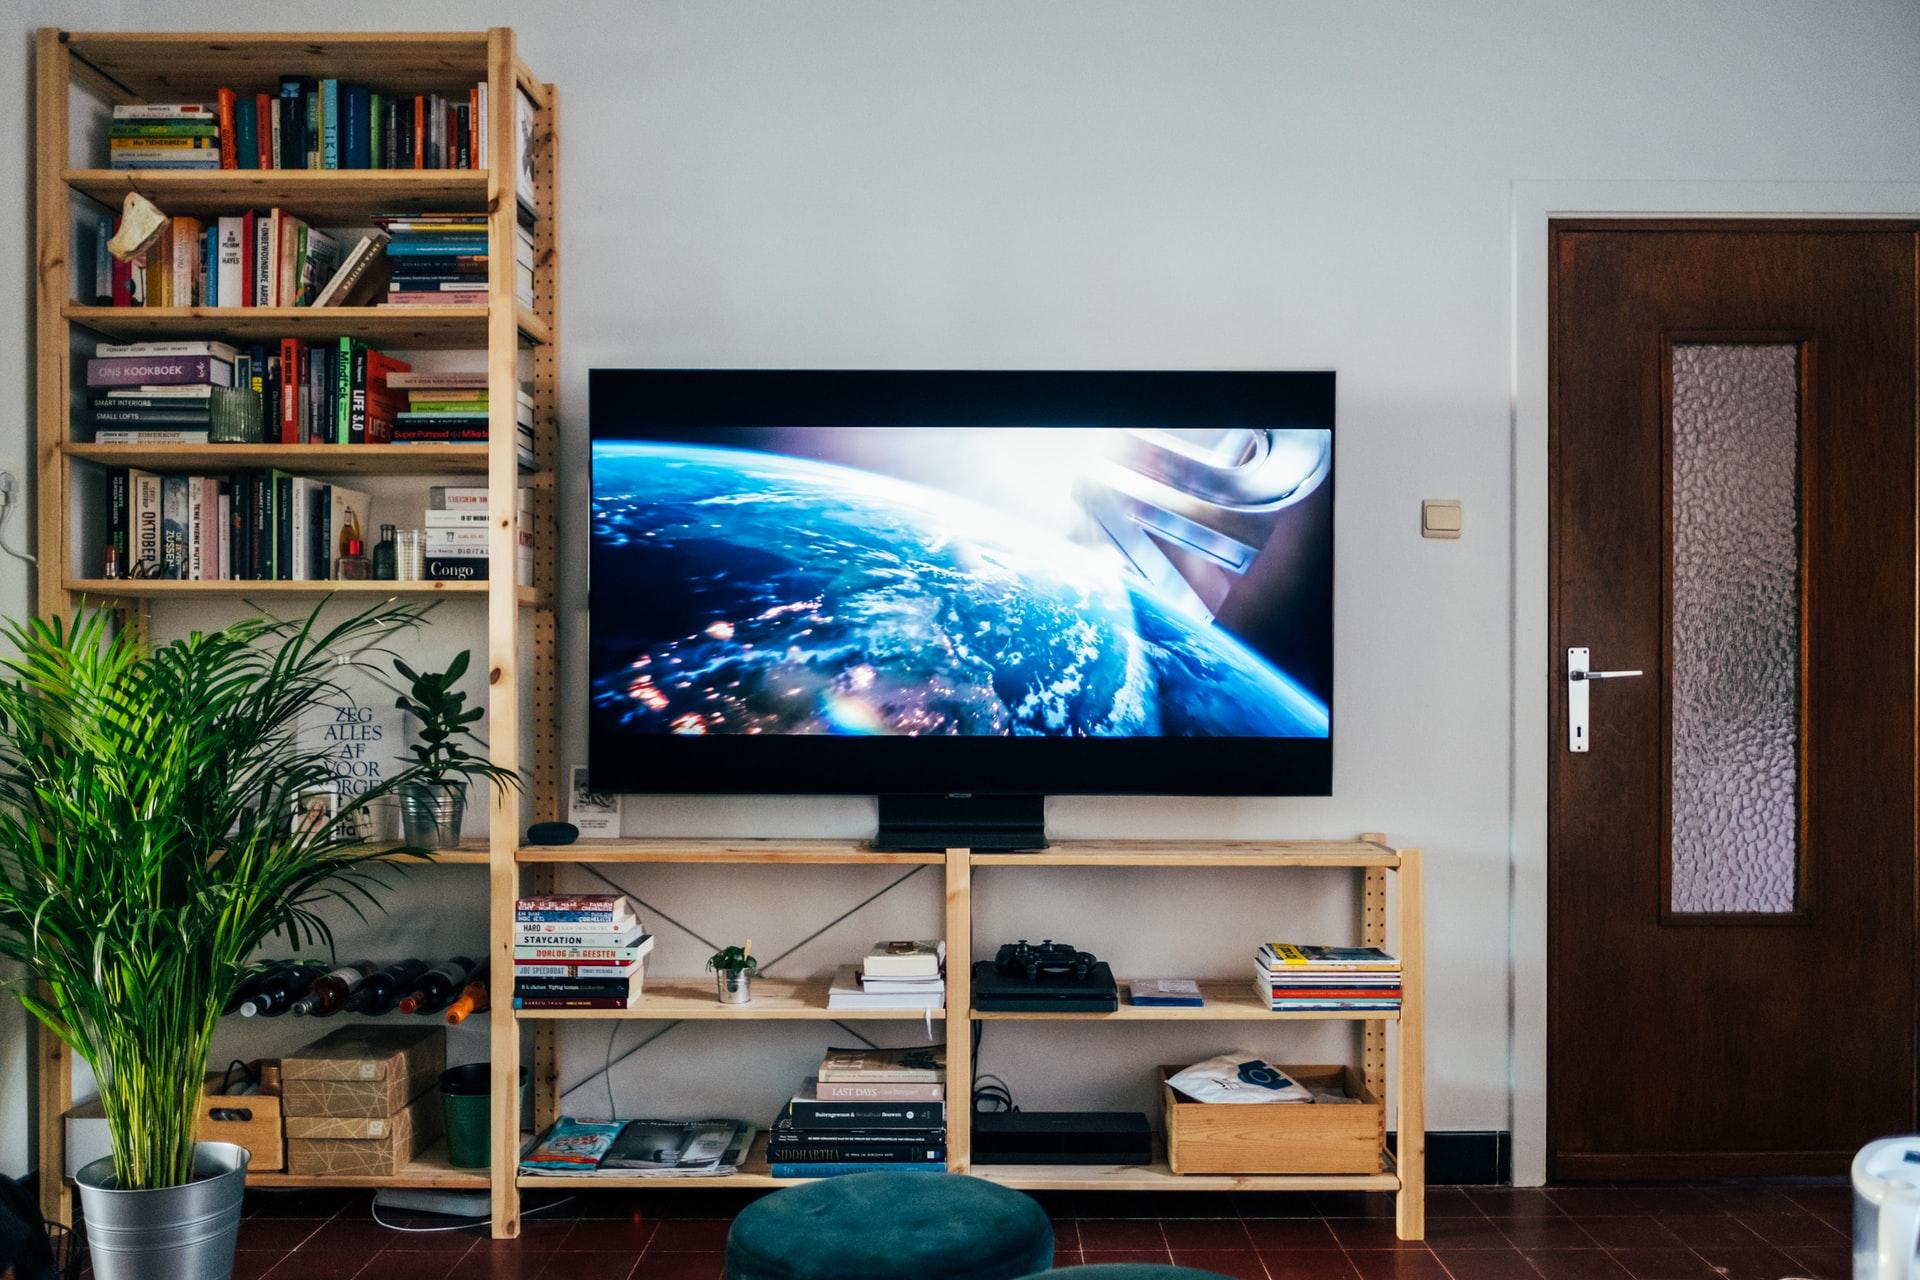 12 TV shows to watch if you like WandaVision